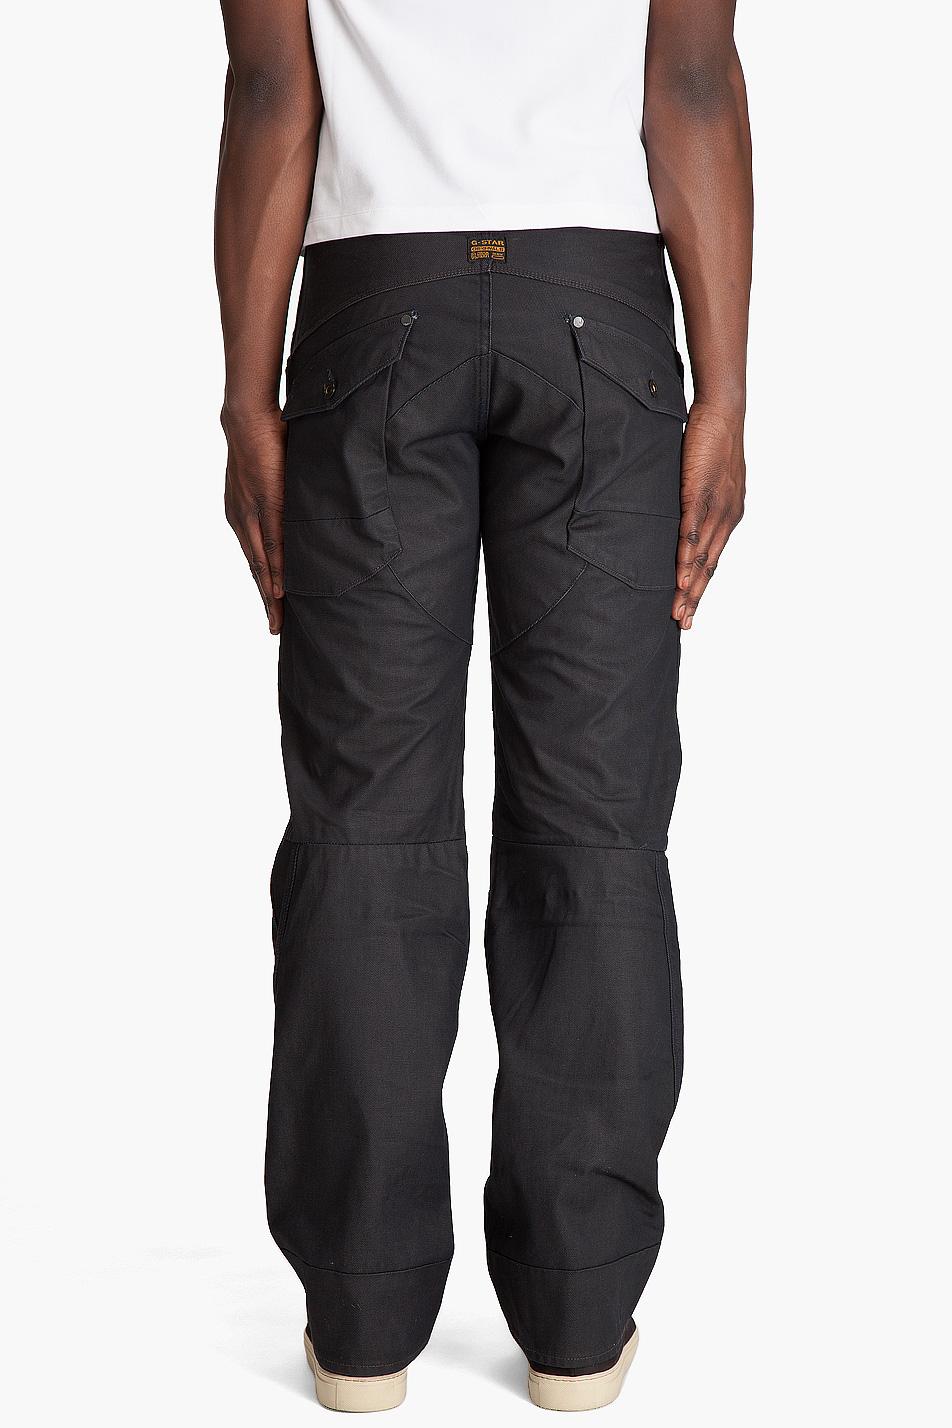 lyst g star raw scuba loose brace denim jeans in blue for men. Black Bedroom Furniture Sets. Home Design Ideas